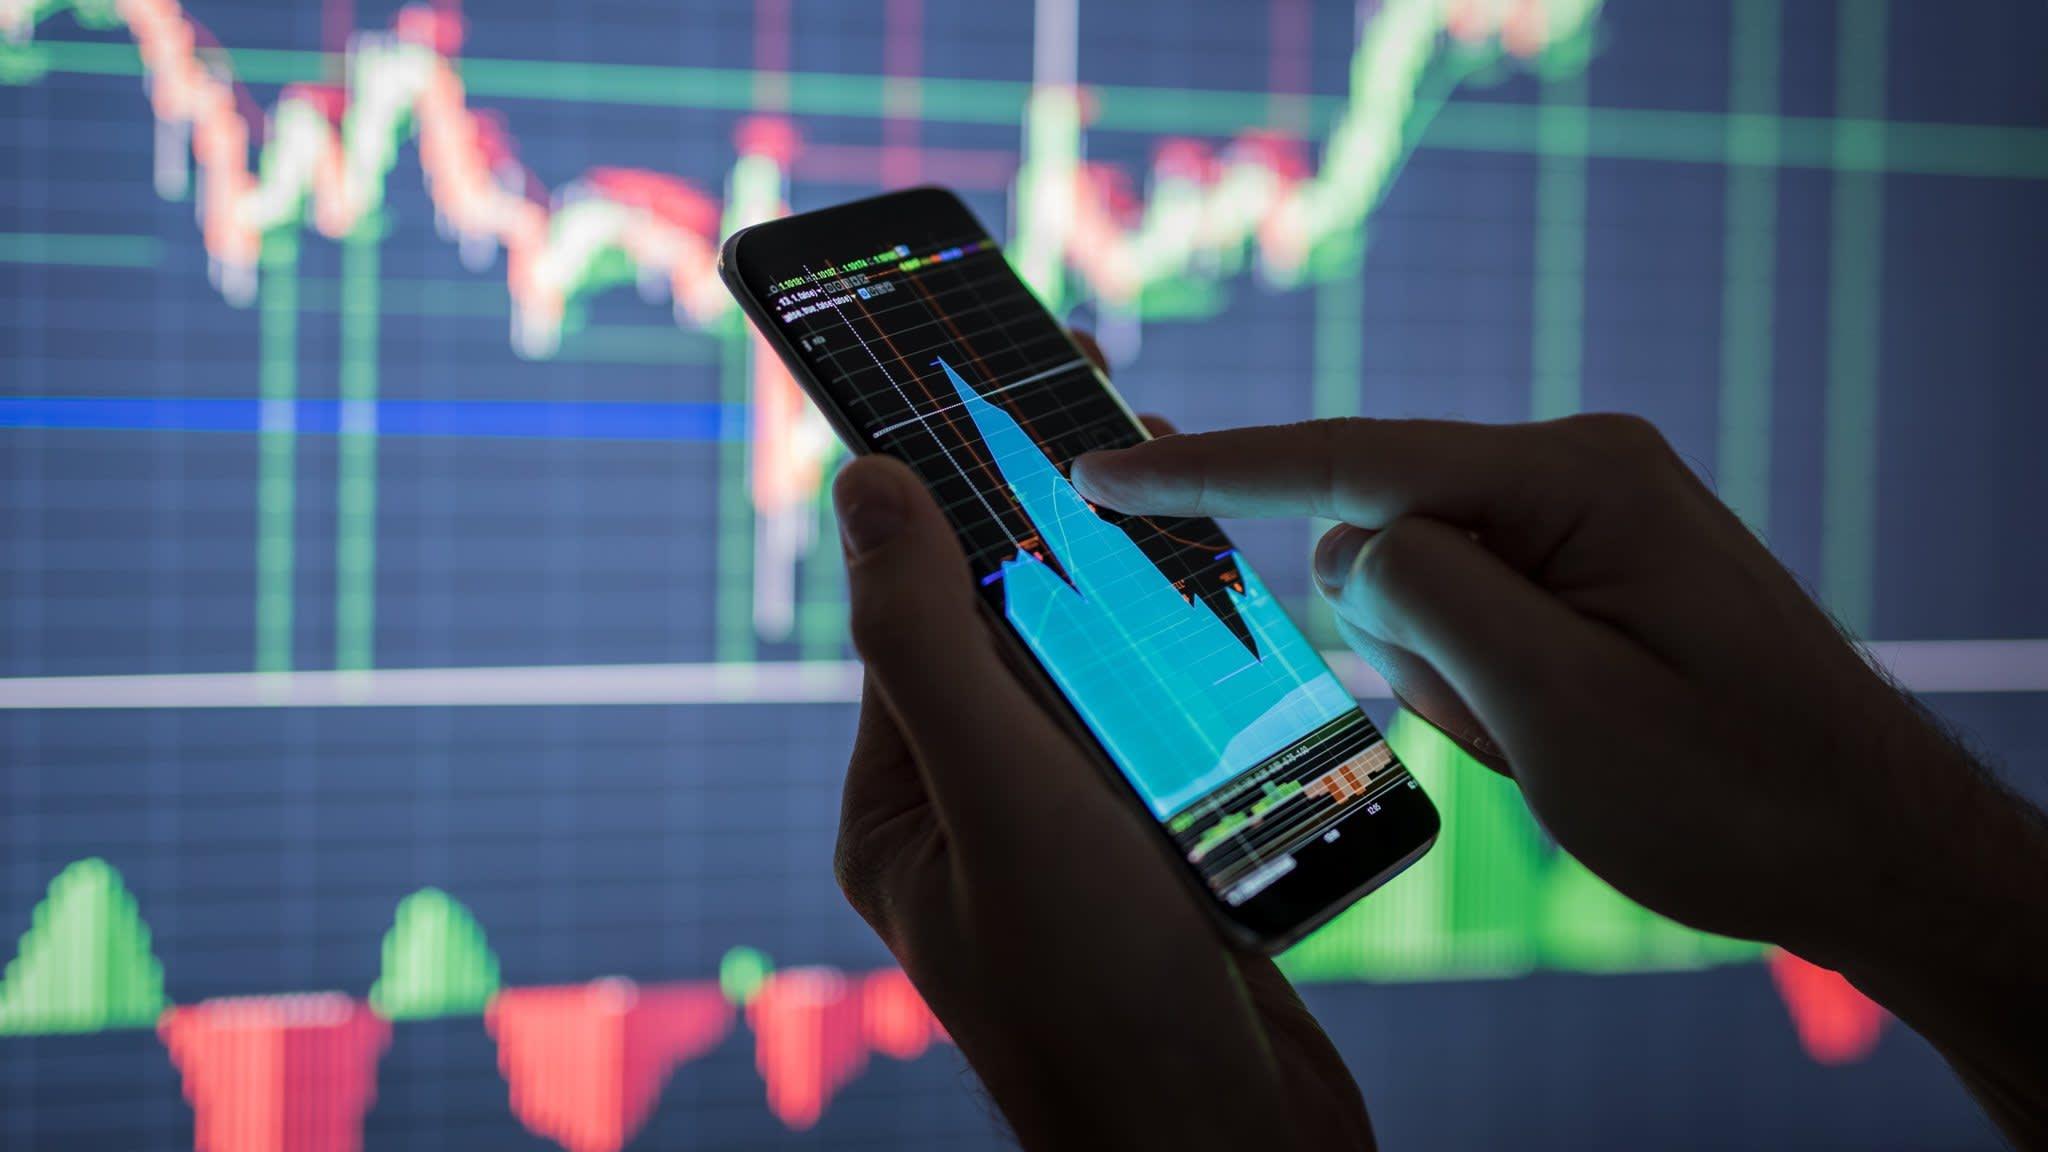 Performance rebound teases macro hedge fund investors